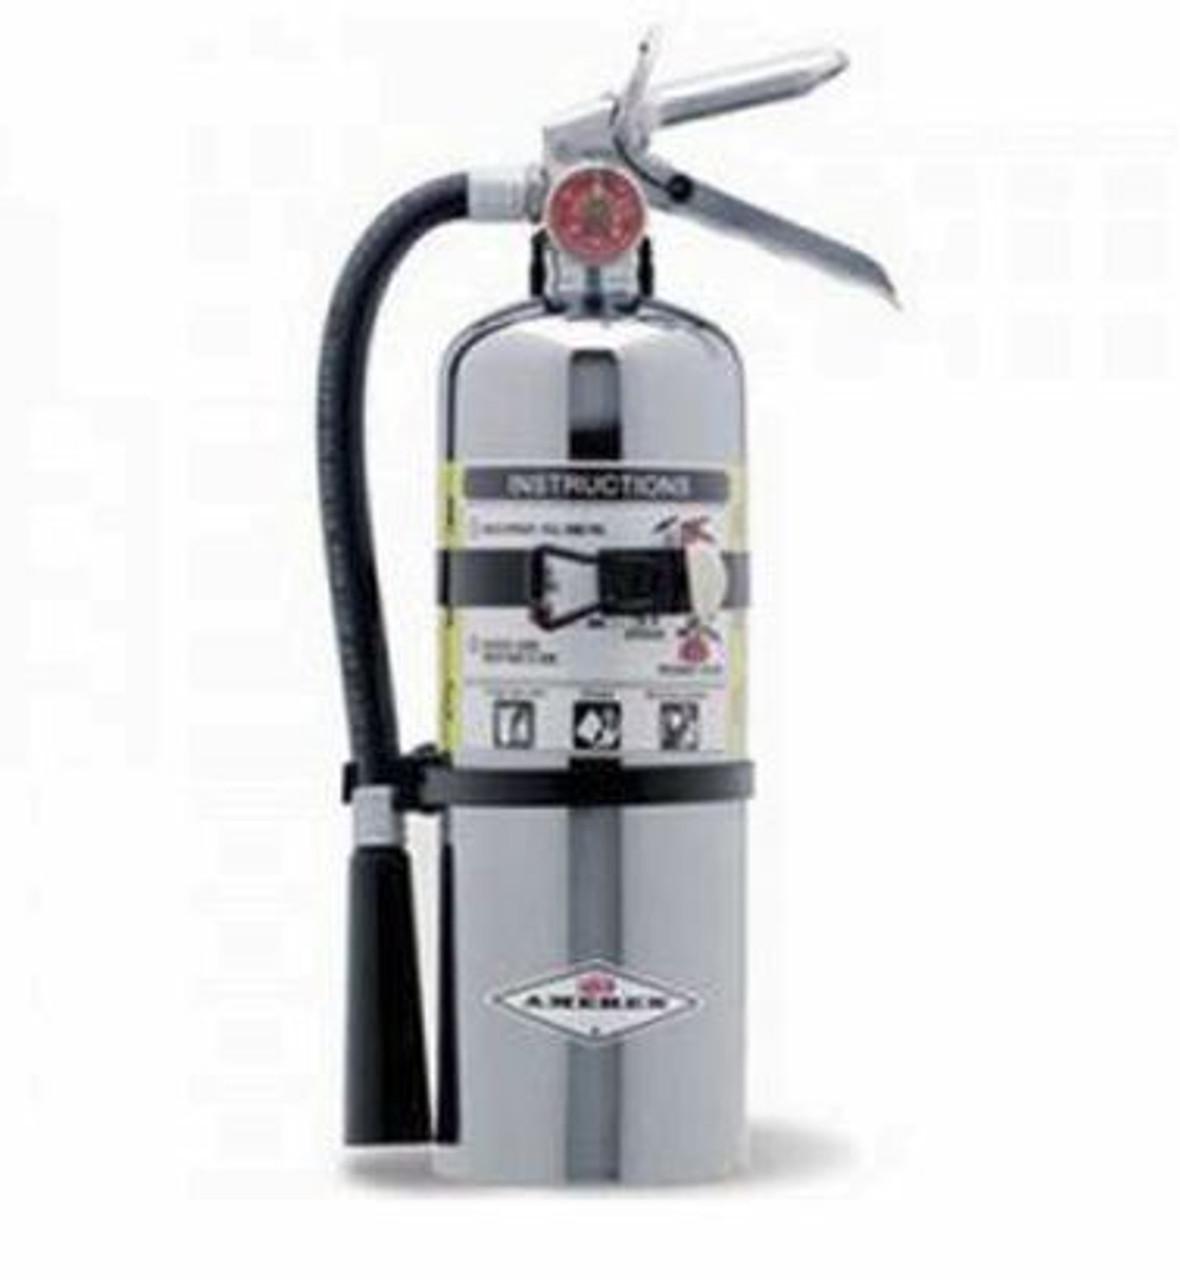 Amerex B500C - 5 lb Chrome ABC Fire Extinguisher (with wall bracket)